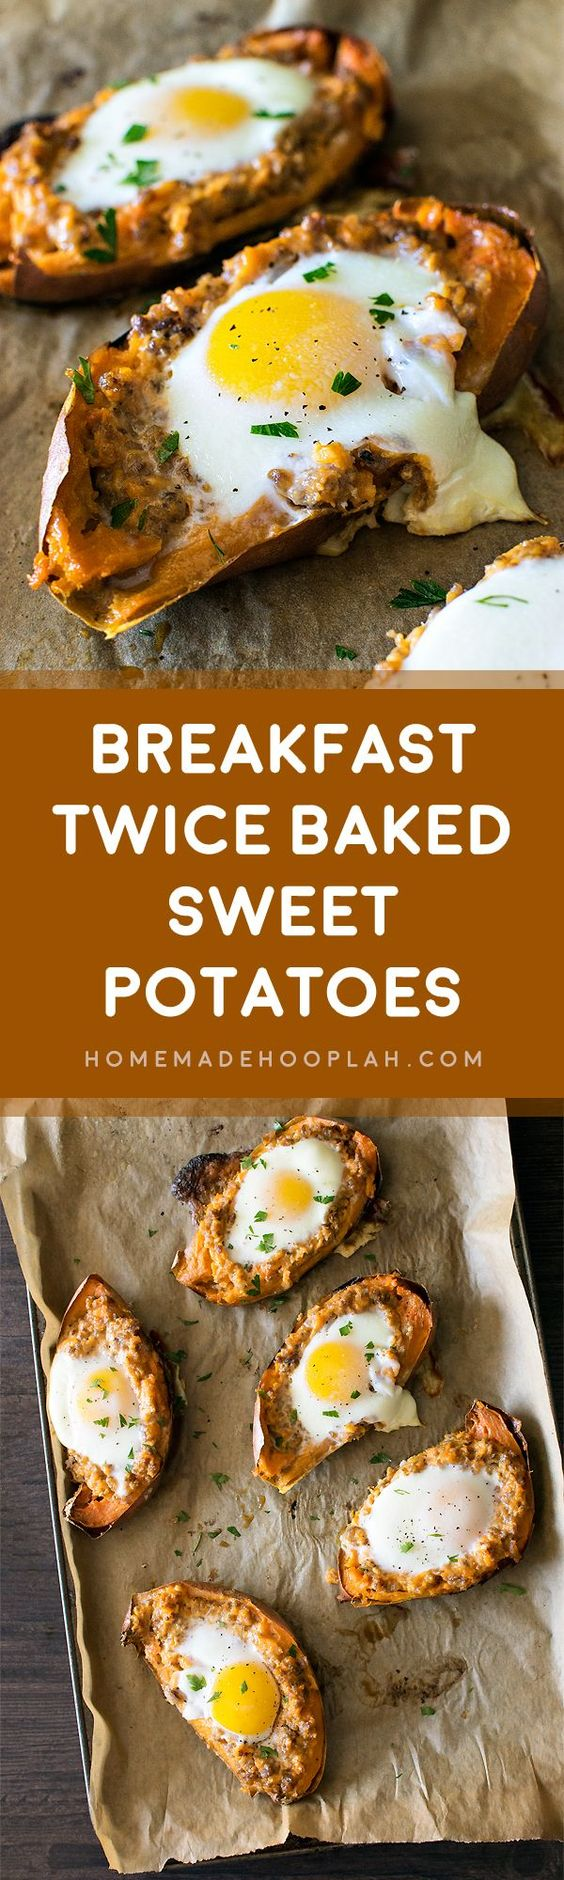 ... gluten over easy eggs sweet twice baked sweet potatoes healthy